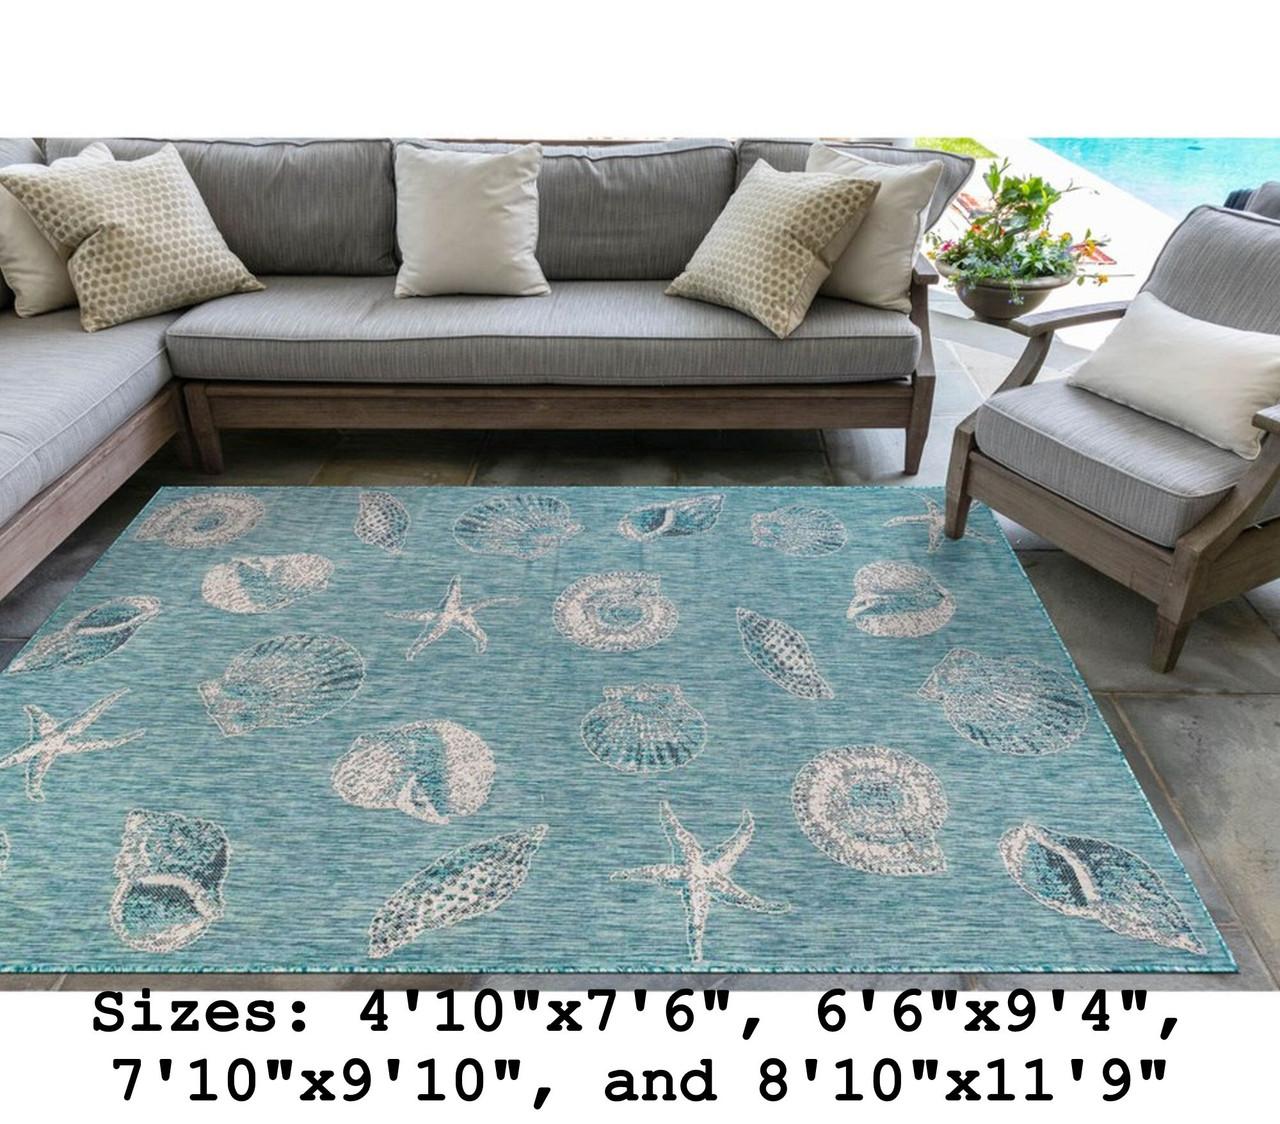 Aqua Carmel Shells Indoor/Outdoor Rug - Rectangle Lifestyle